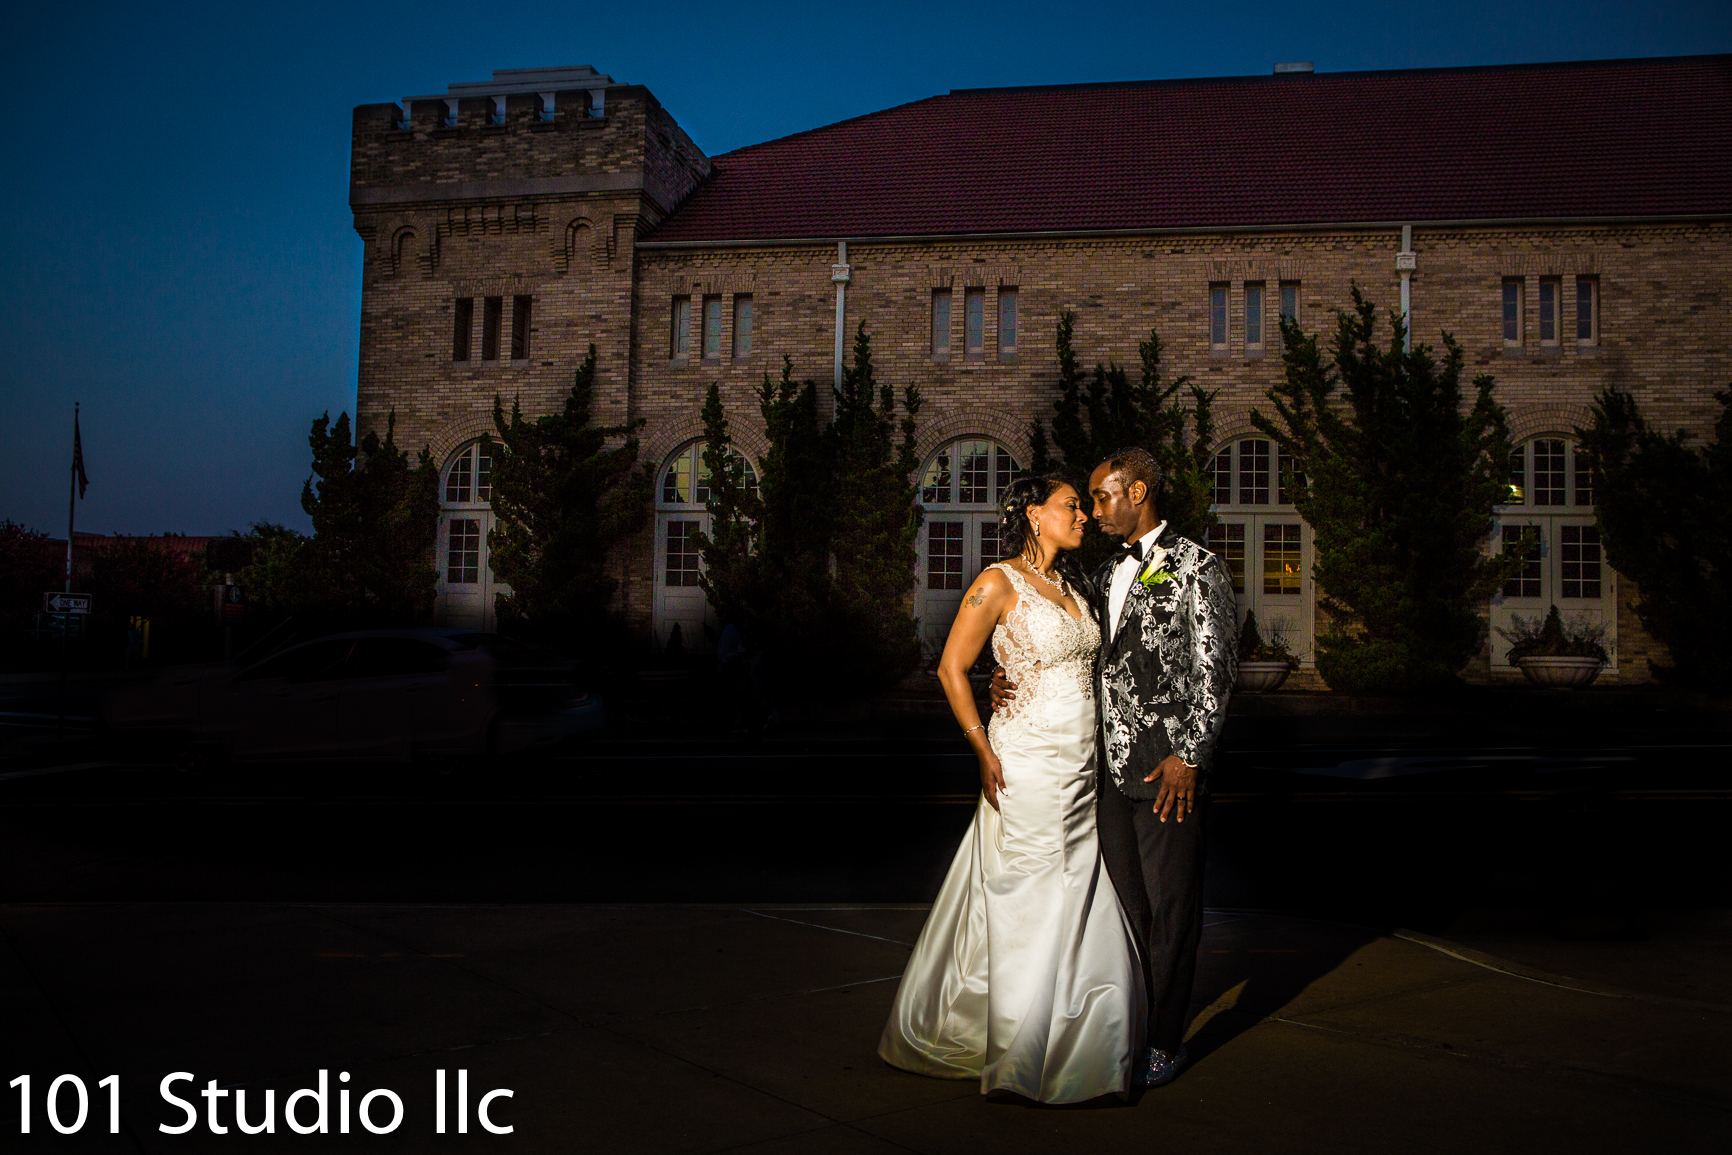 Raleigh  wedding photographer - 101 Studio llc -20.jpg